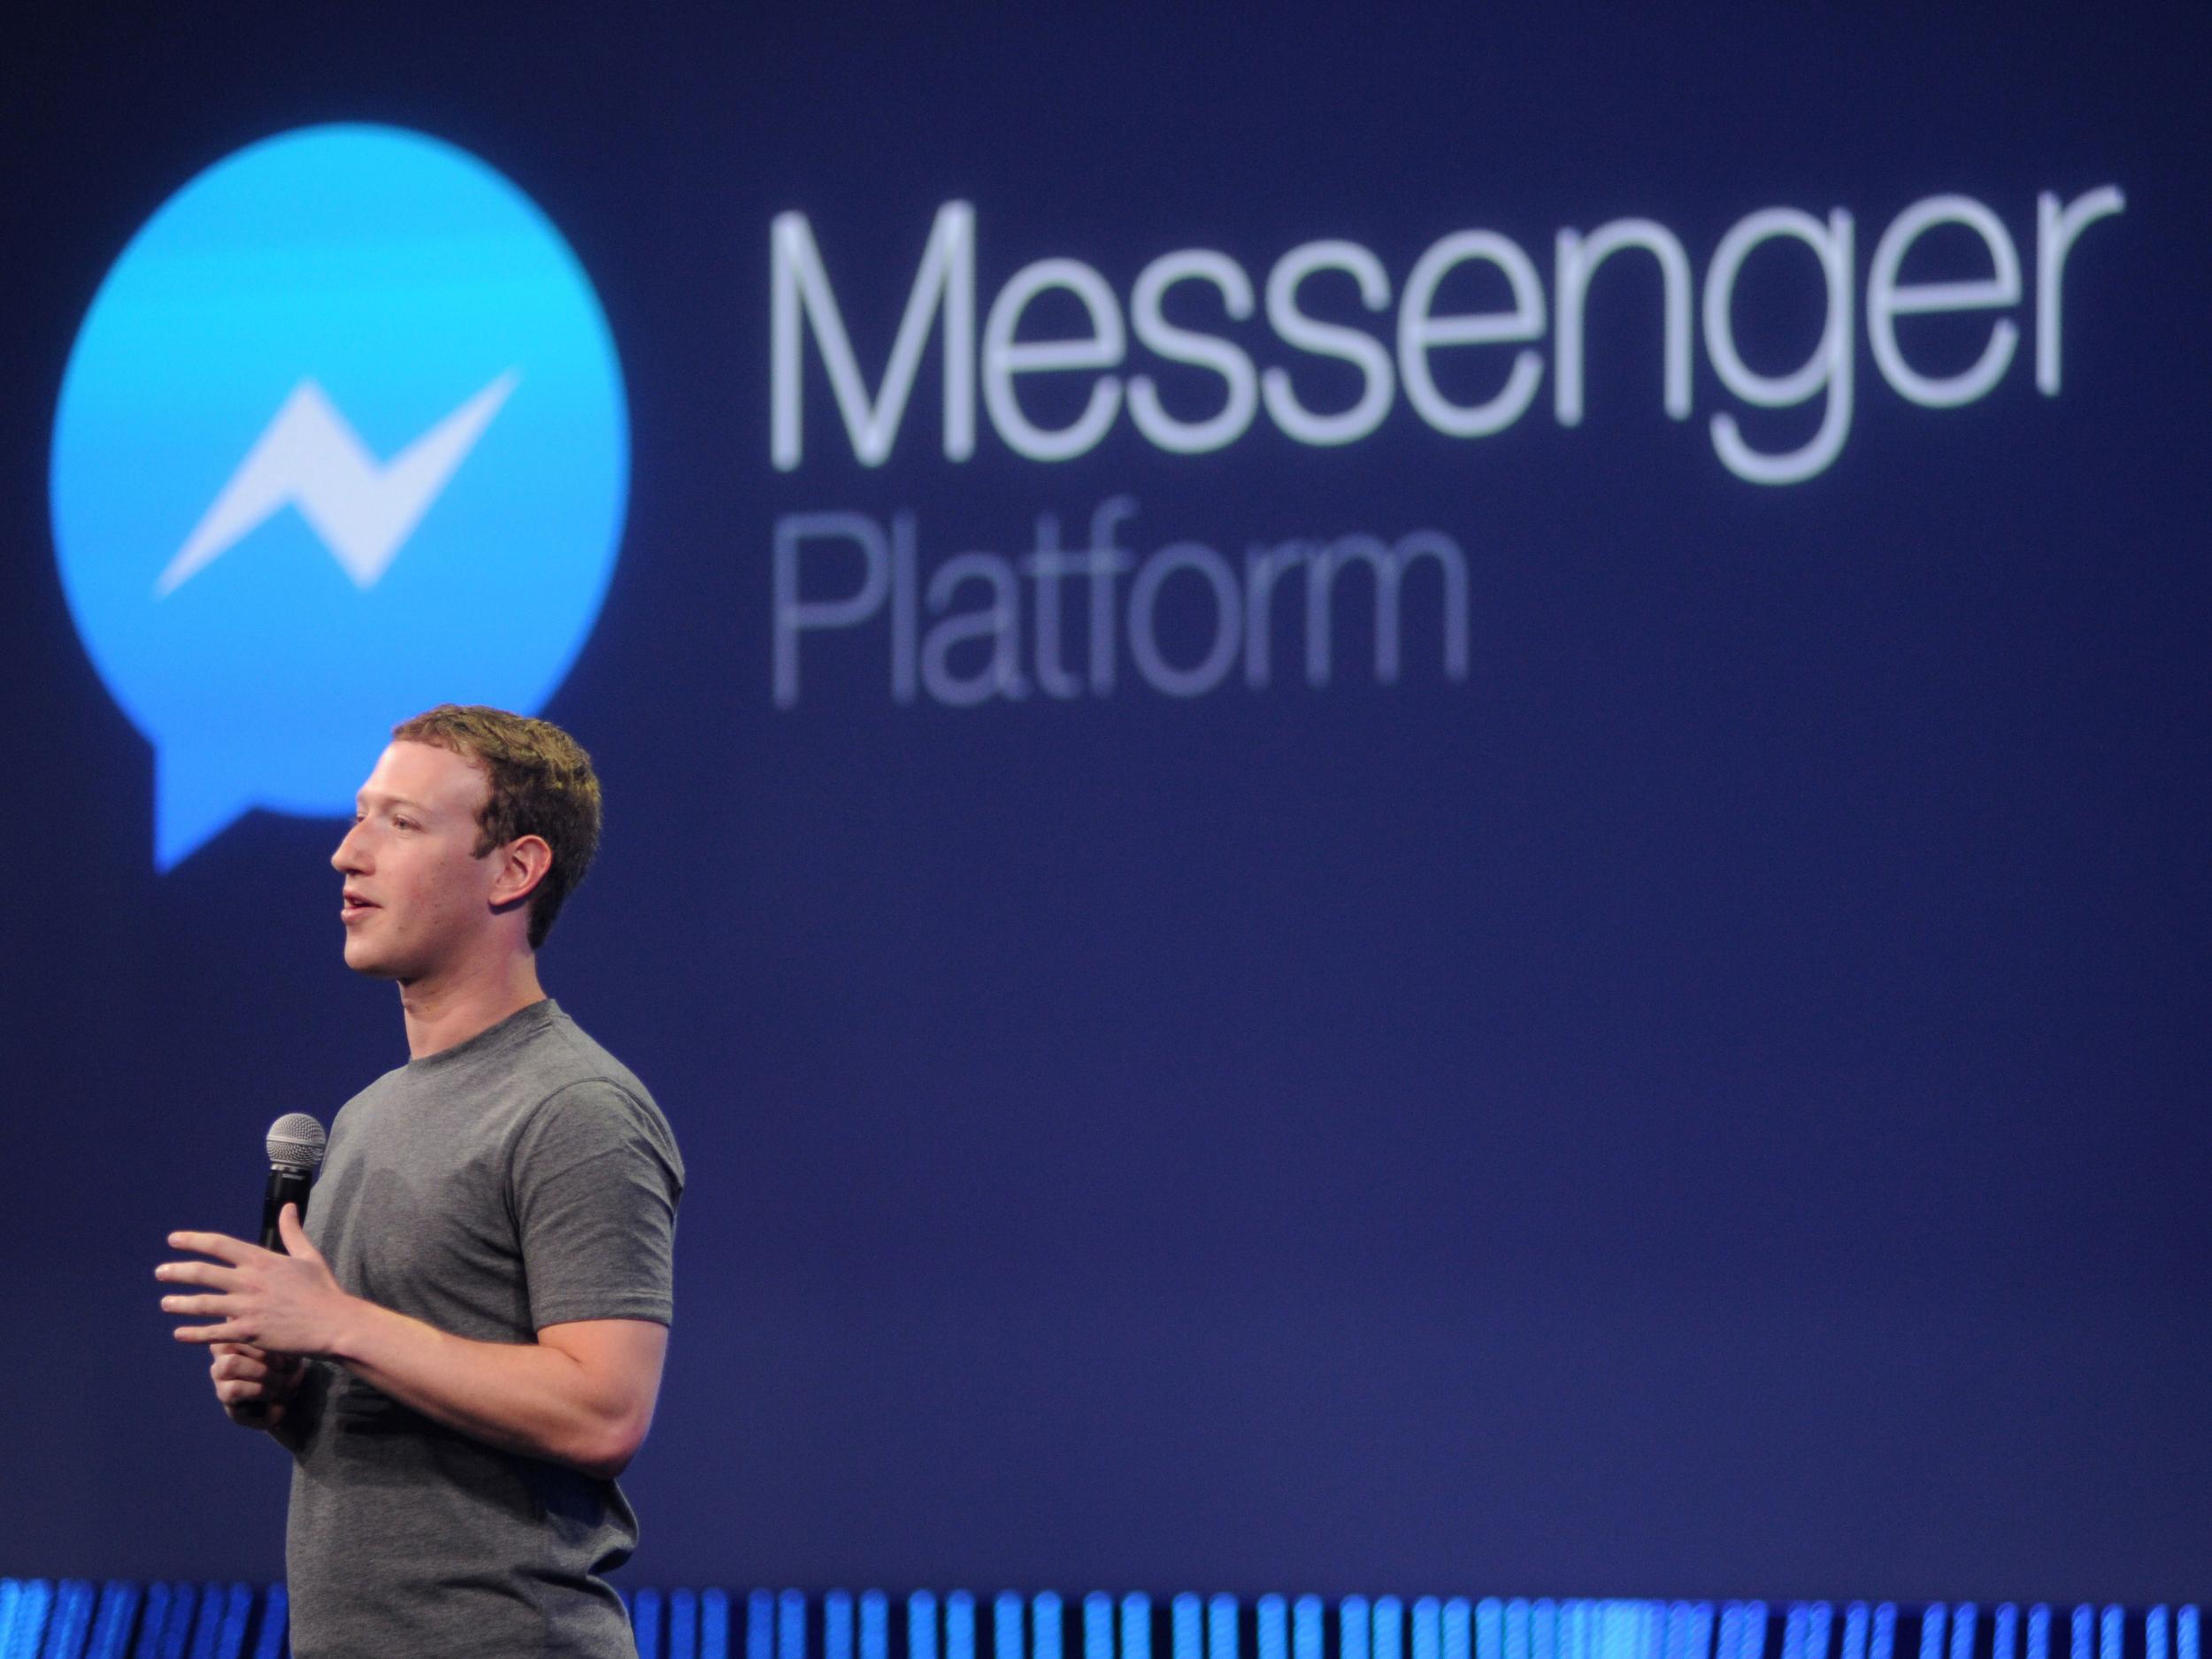 Las videollamadas llegan a Messenger